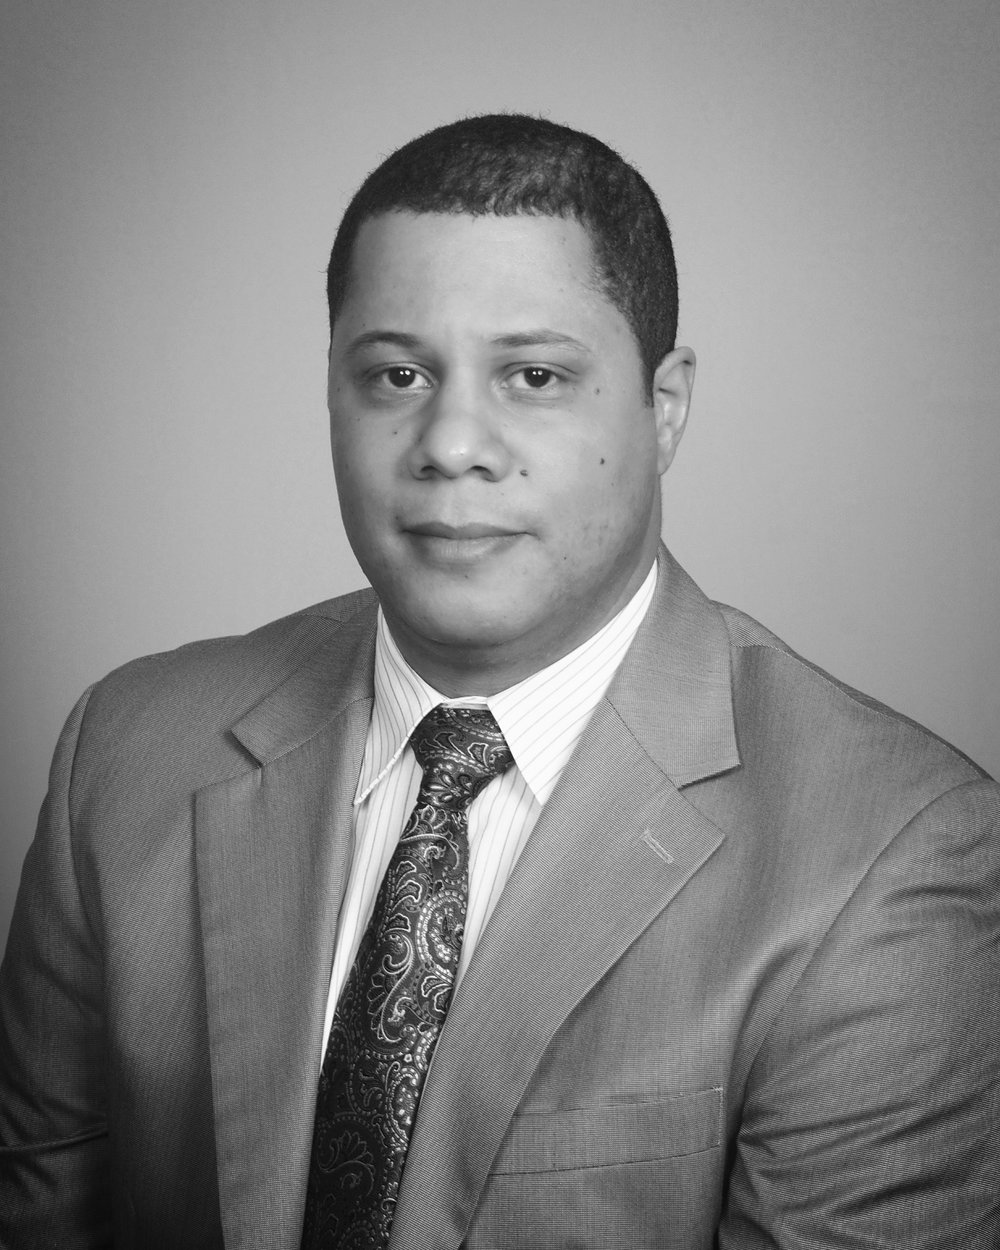 Jay Patrick Kennedy, Ph.D  - Academy M Board Member, Educator and Professor